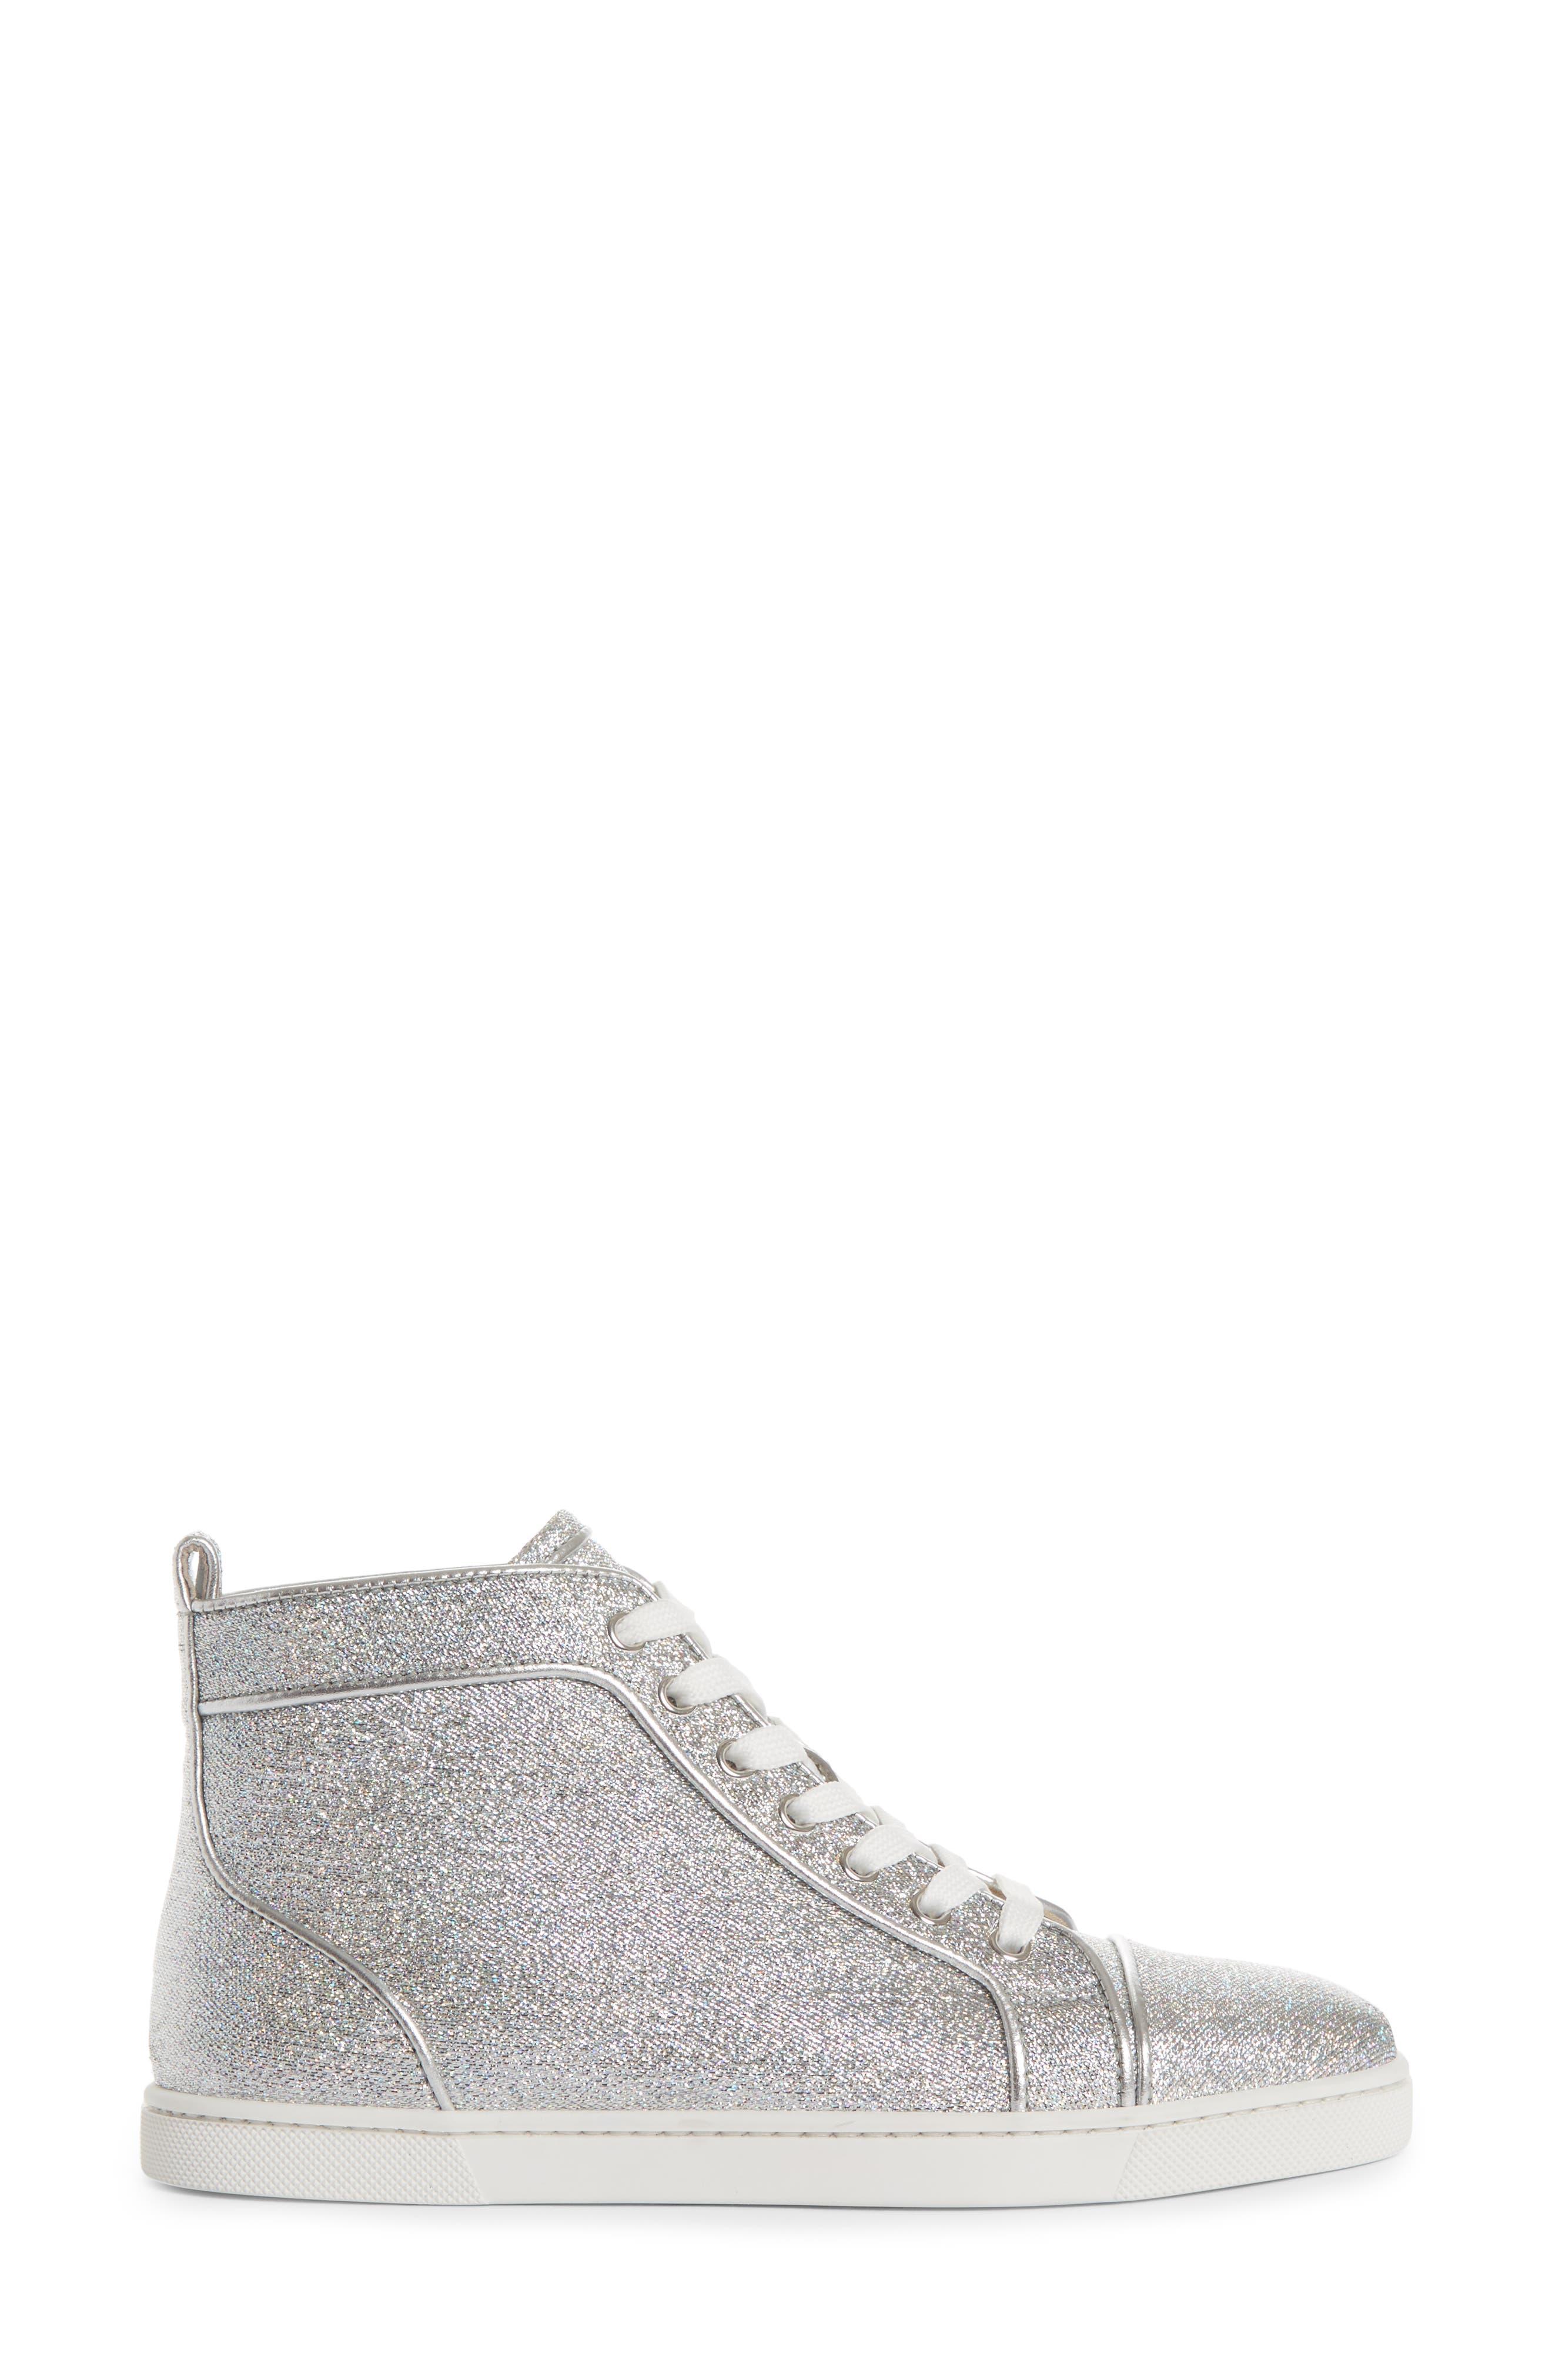 Orlato Metallic High Top Sneaker,                             Alternate thumbnail 3, color,                             040